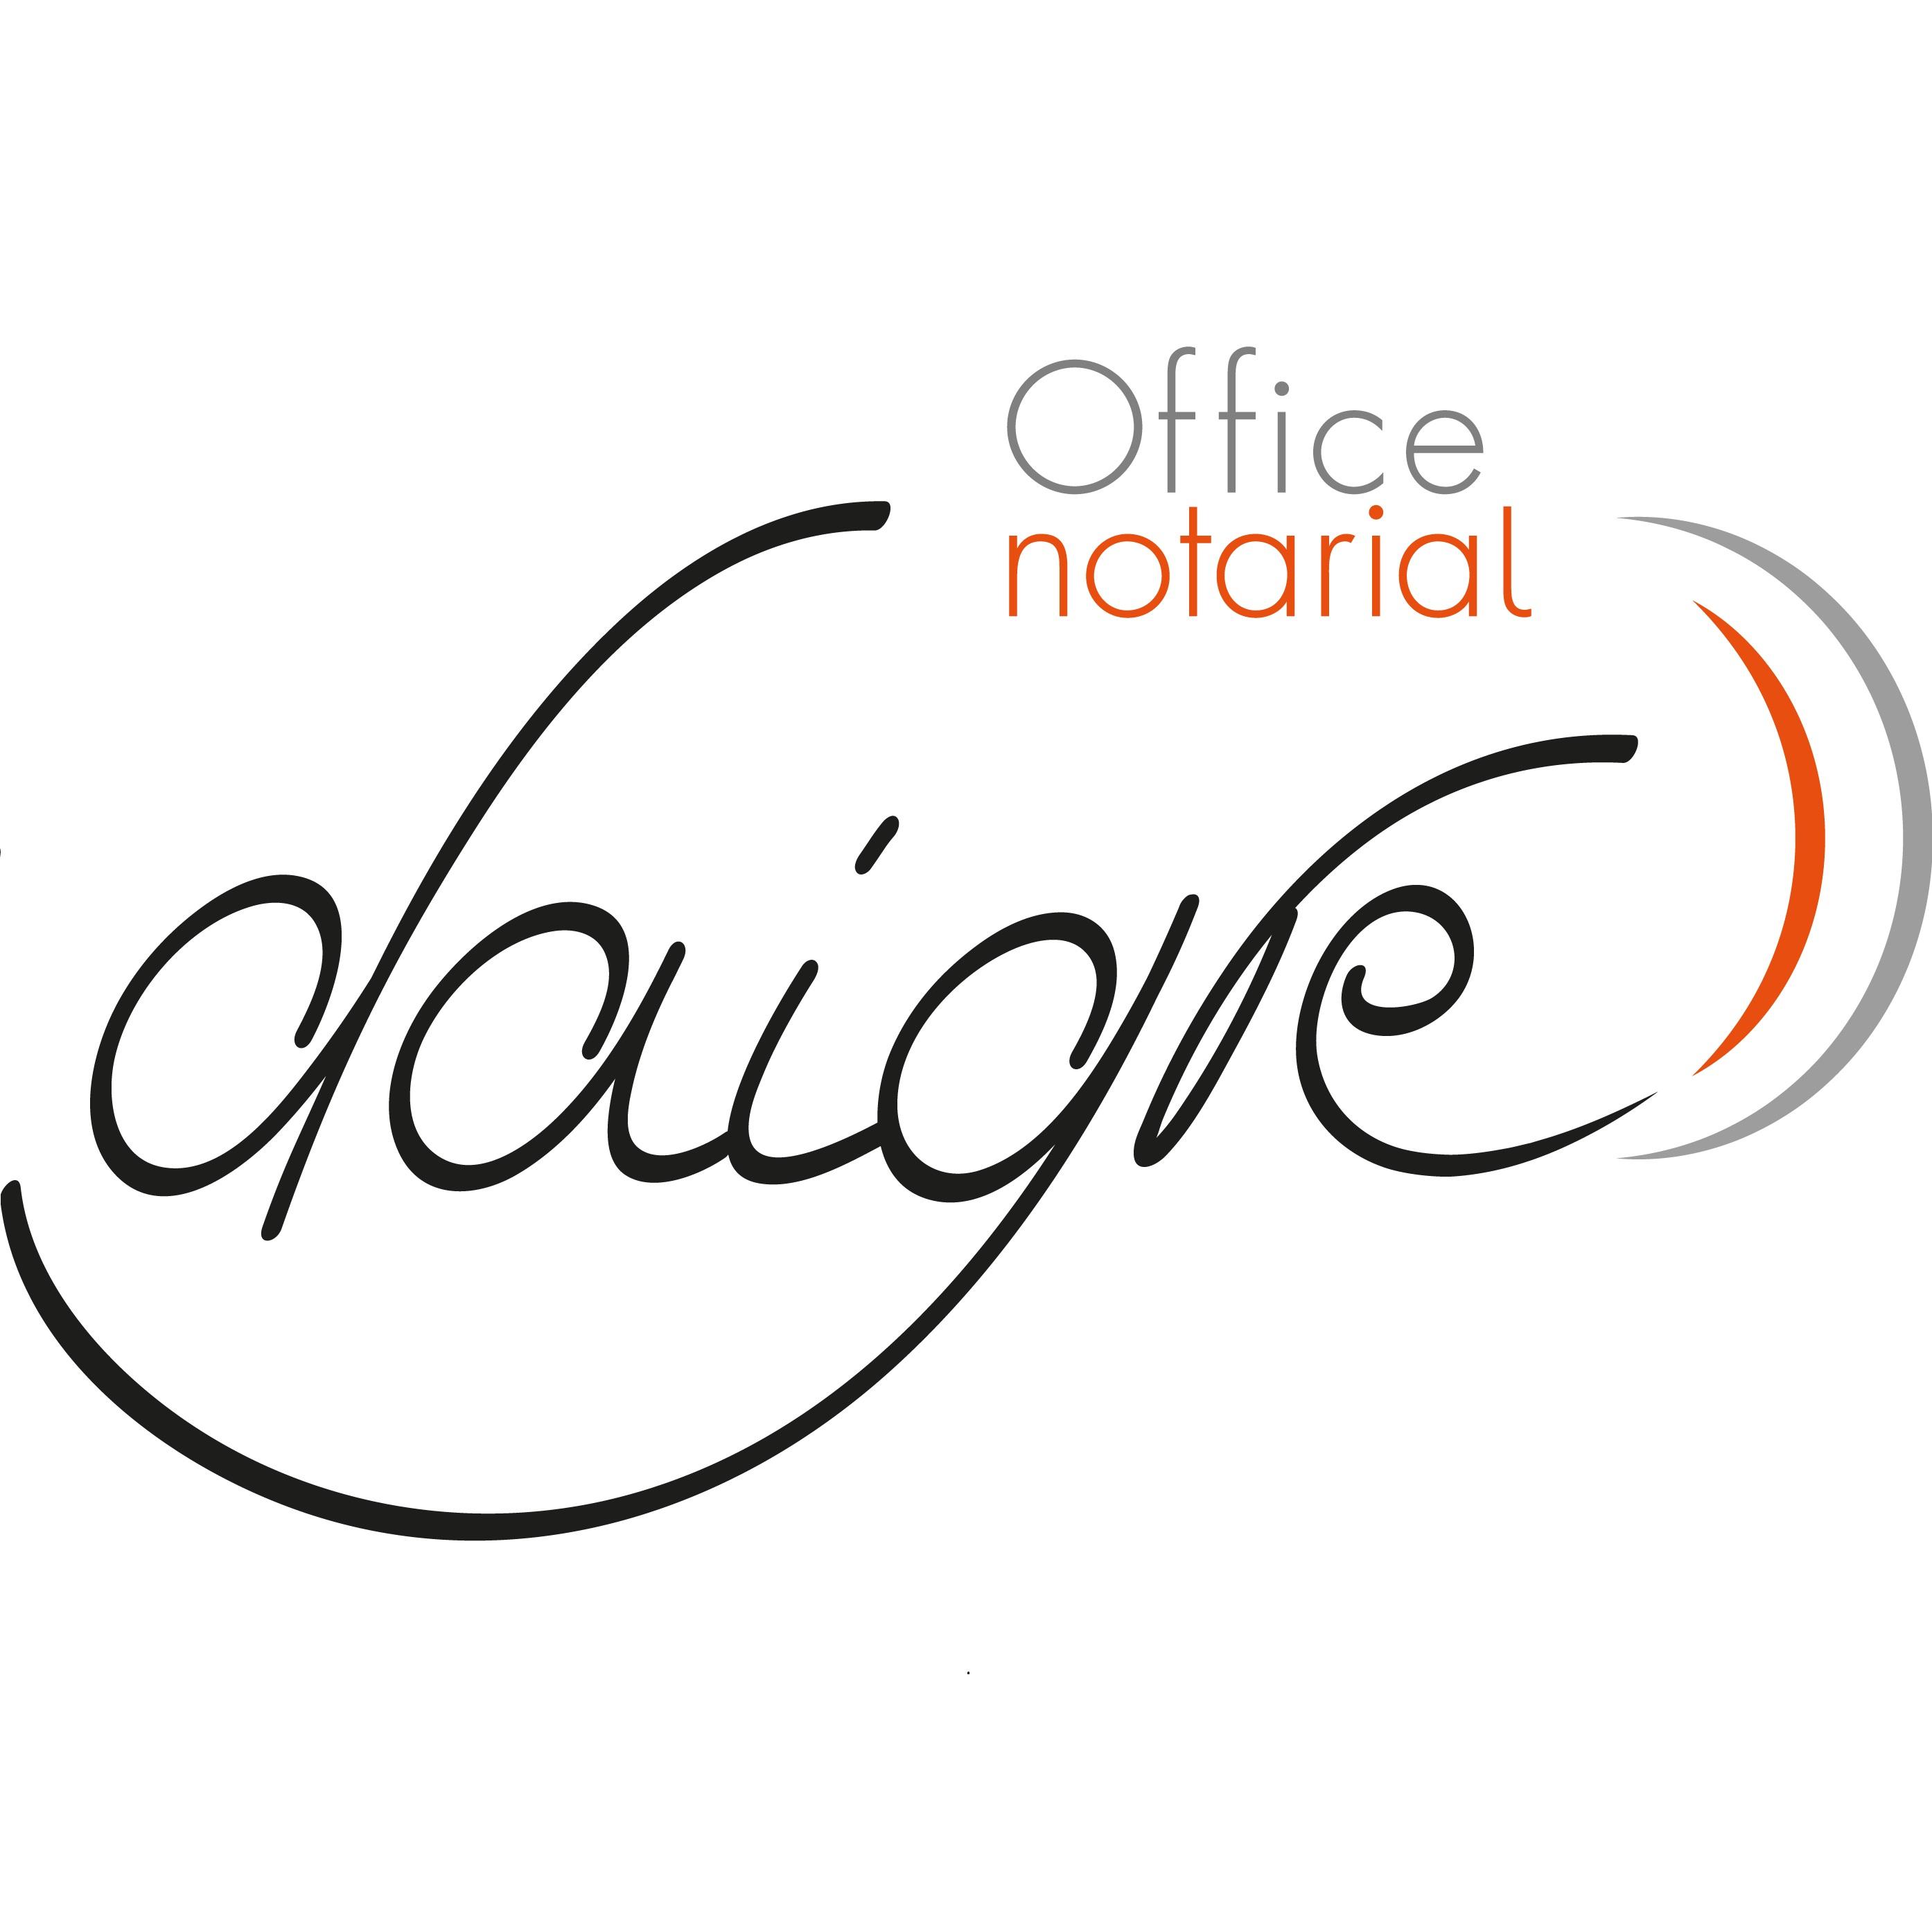 olivier daigre